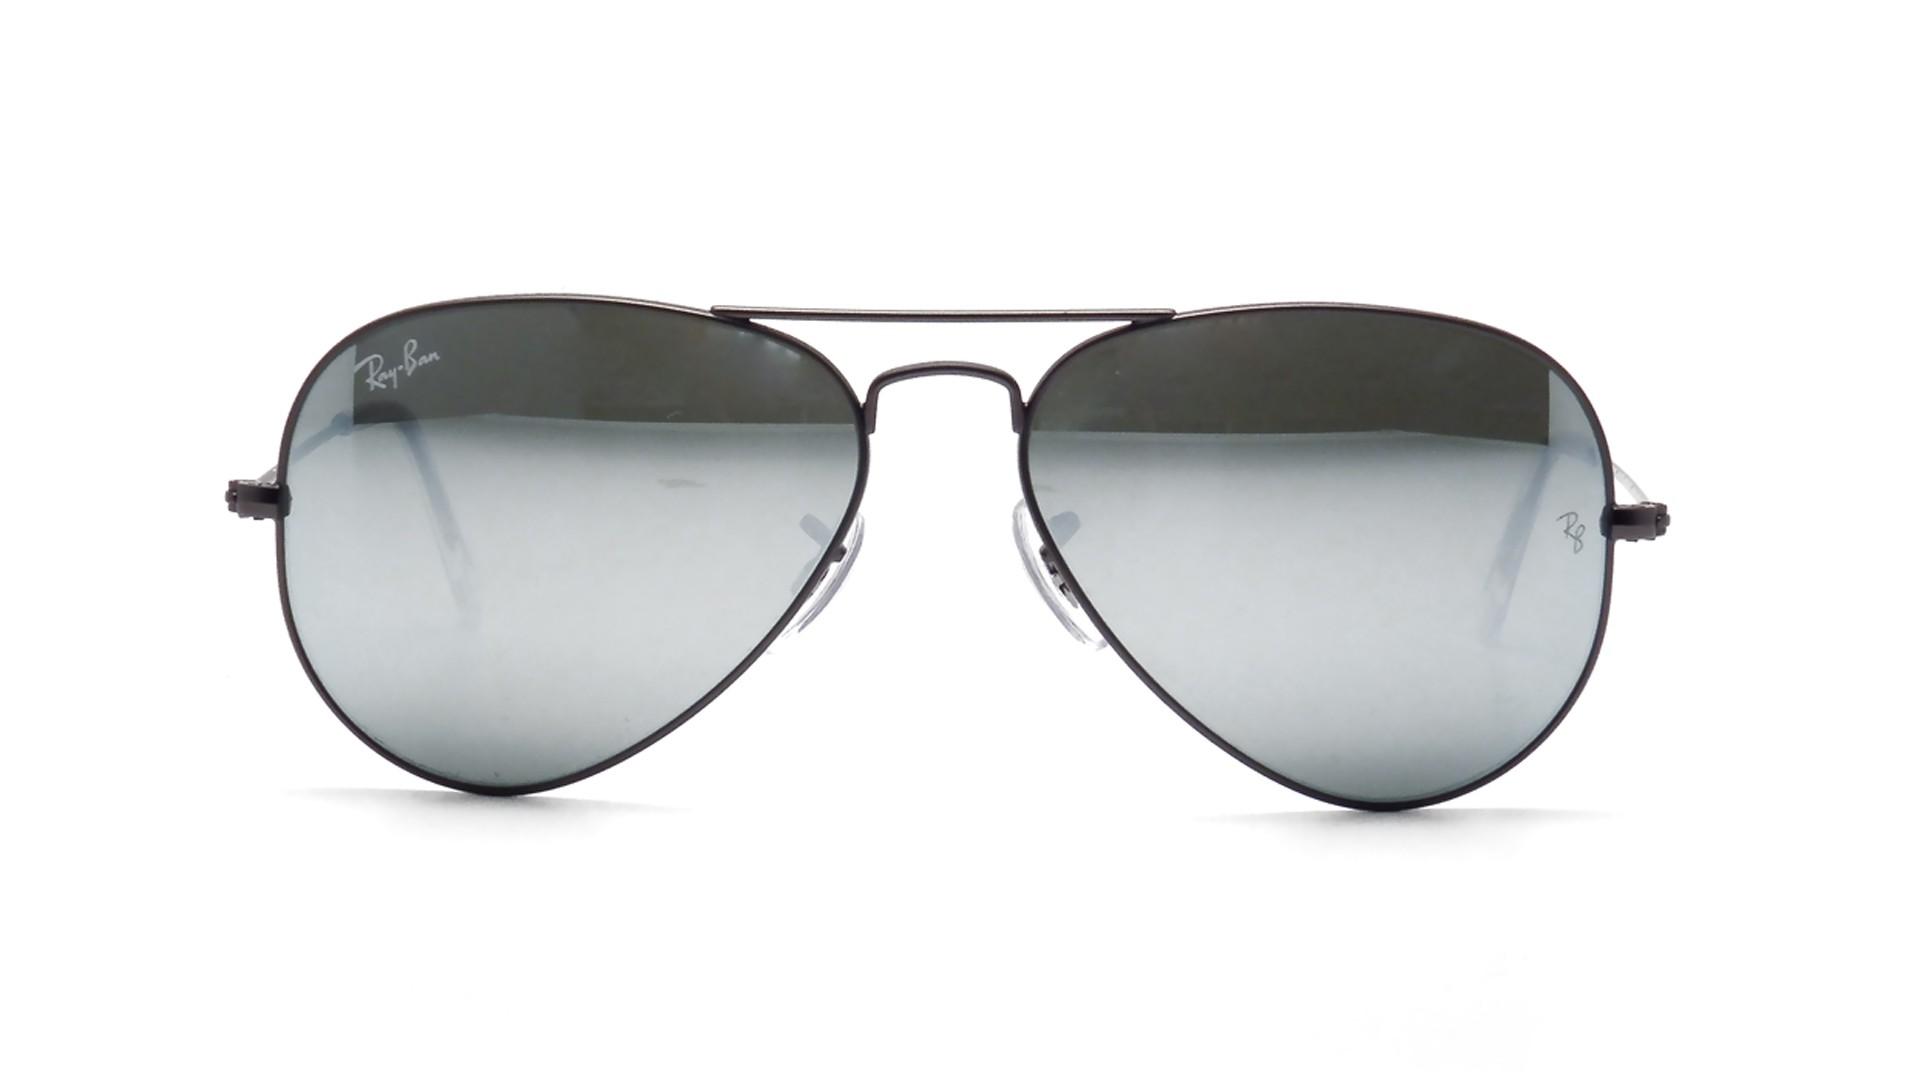 ray ban aviator large metal grey rb3025 029 30 55. Black Bedroom Furniture Sets. Home Design Ideas